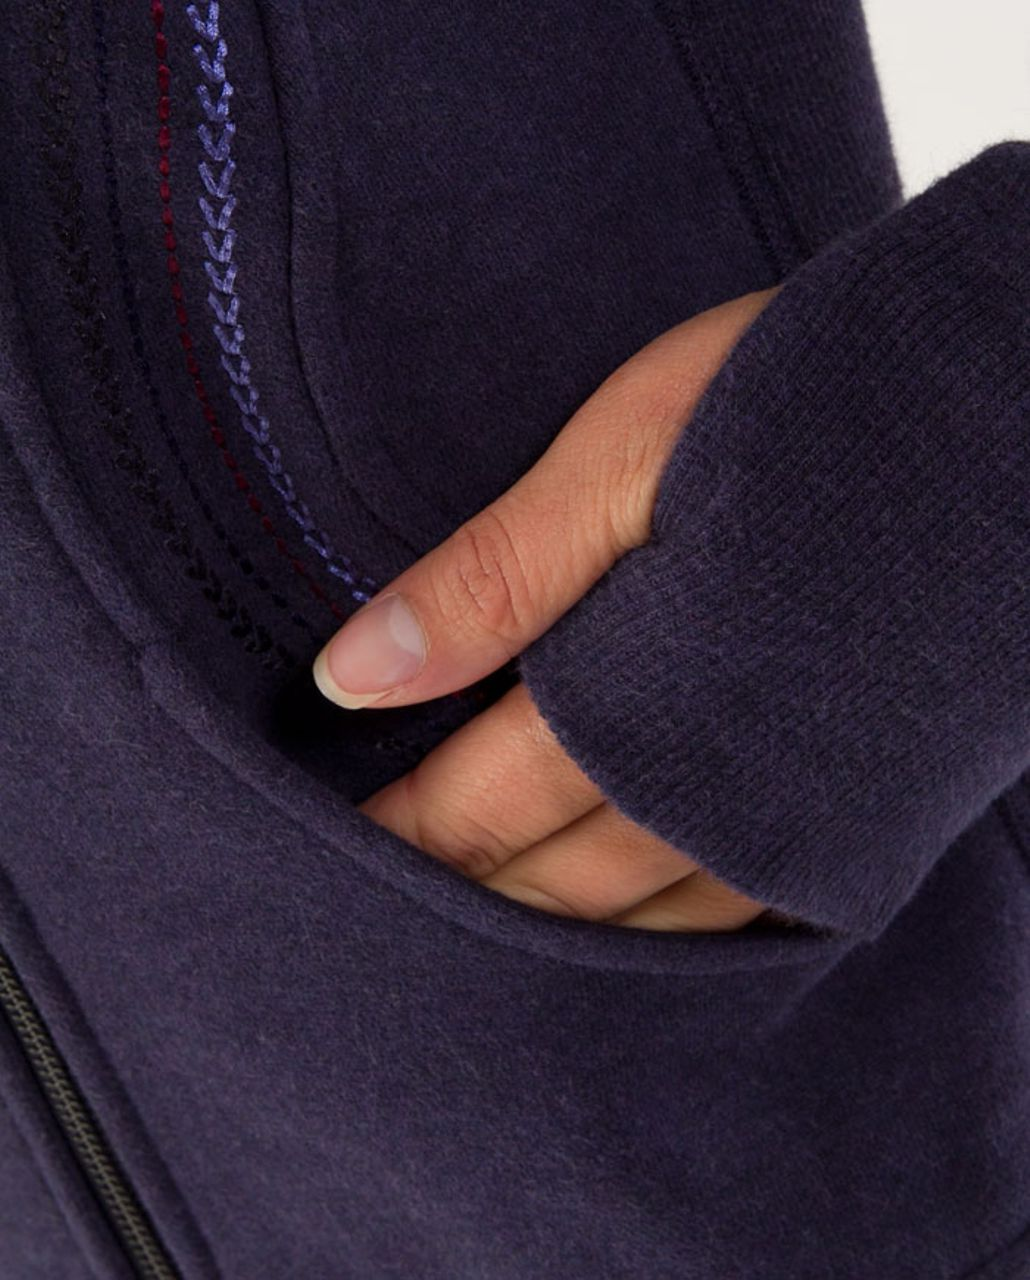 Lululemon Cuddle Up Jacket - Heathered Black Swan (Light Trim)